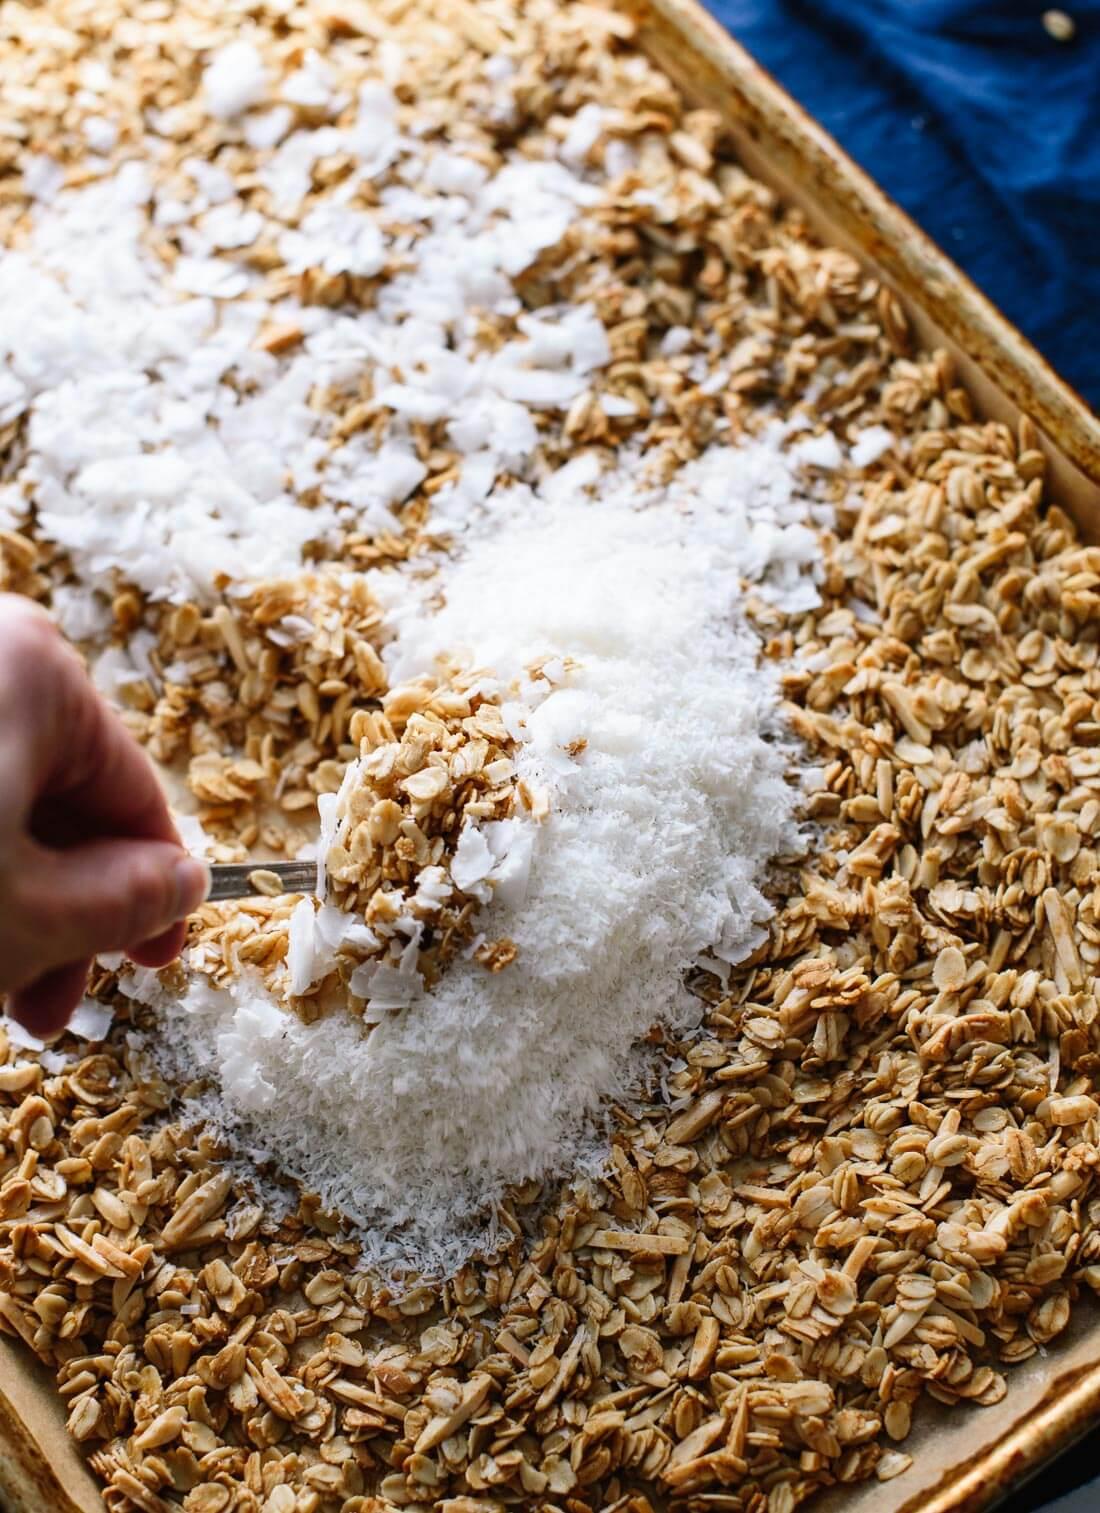 Stirring coconut into coconut granola - cookieandkate.com